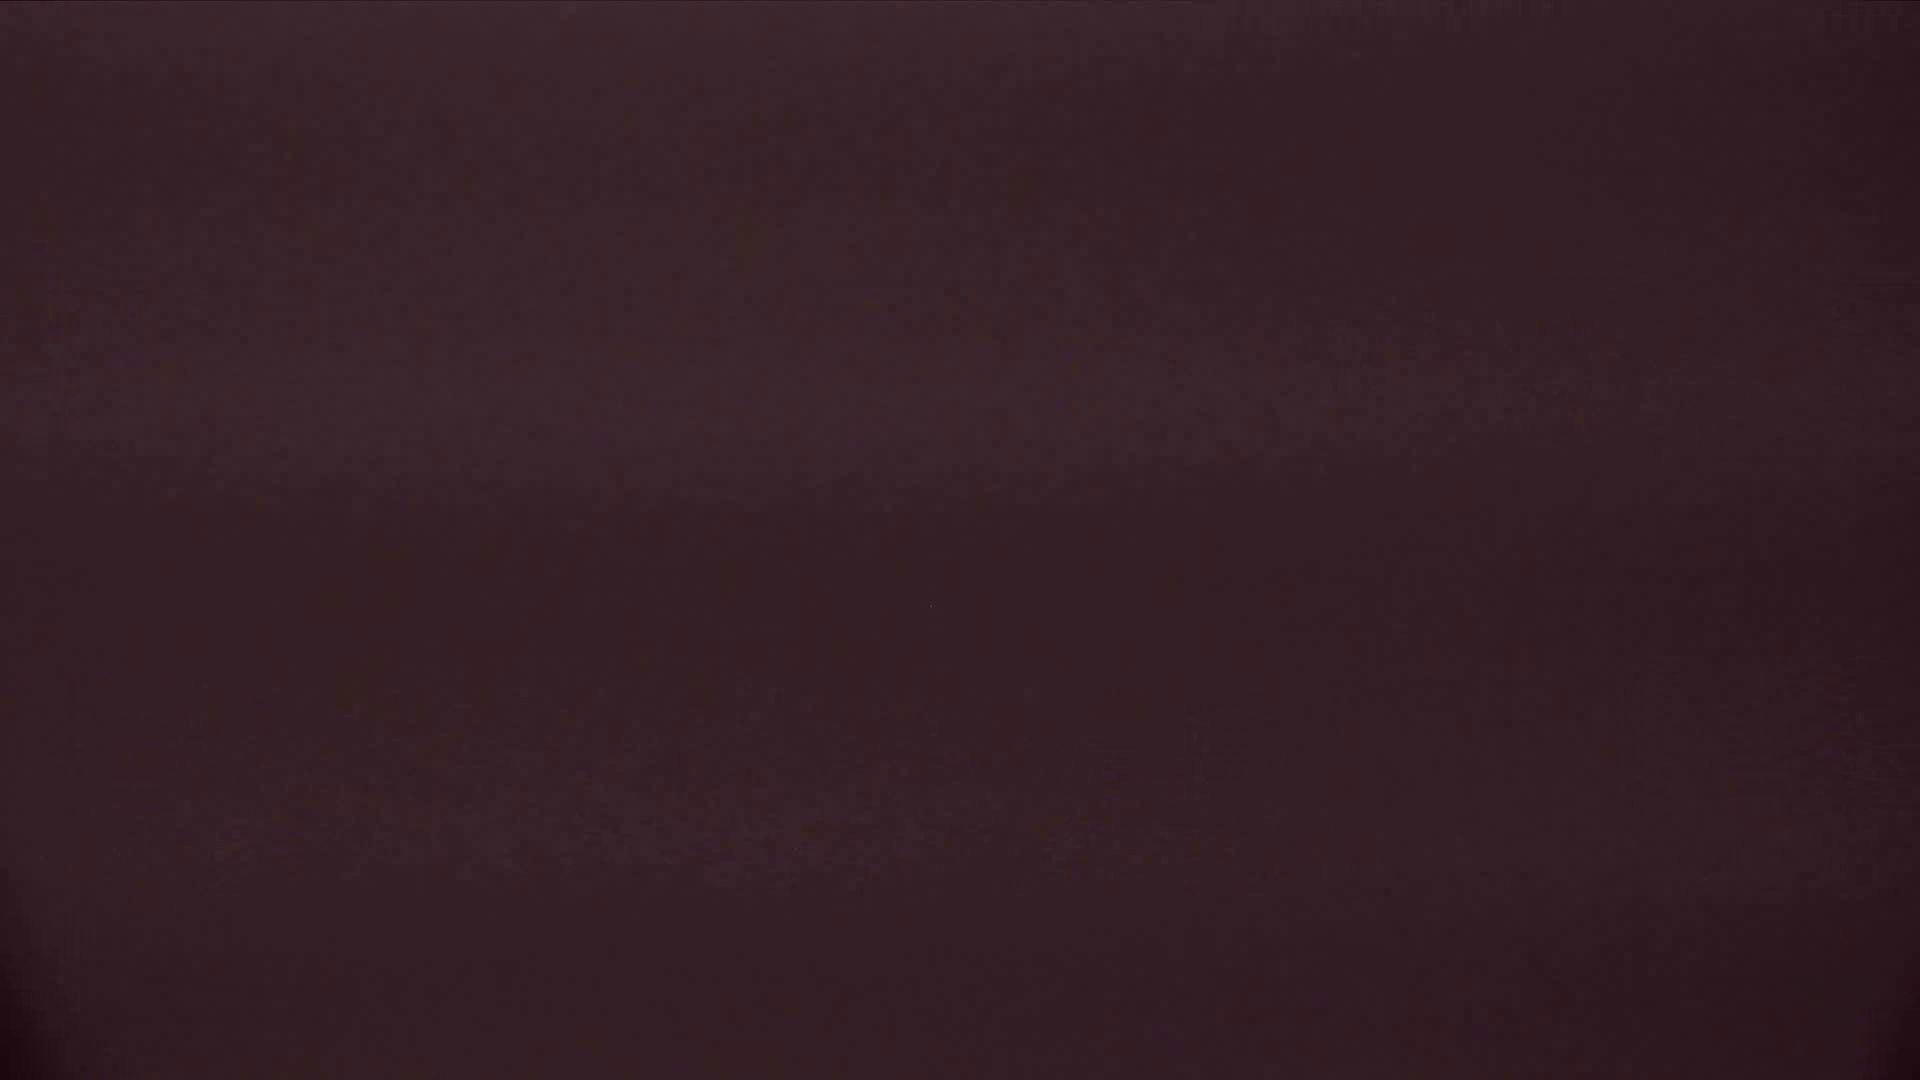 vol.18 命がけ潜伏洗面所! お好みがきっと見つかる 洗面所 性交動画流出 99連発 46